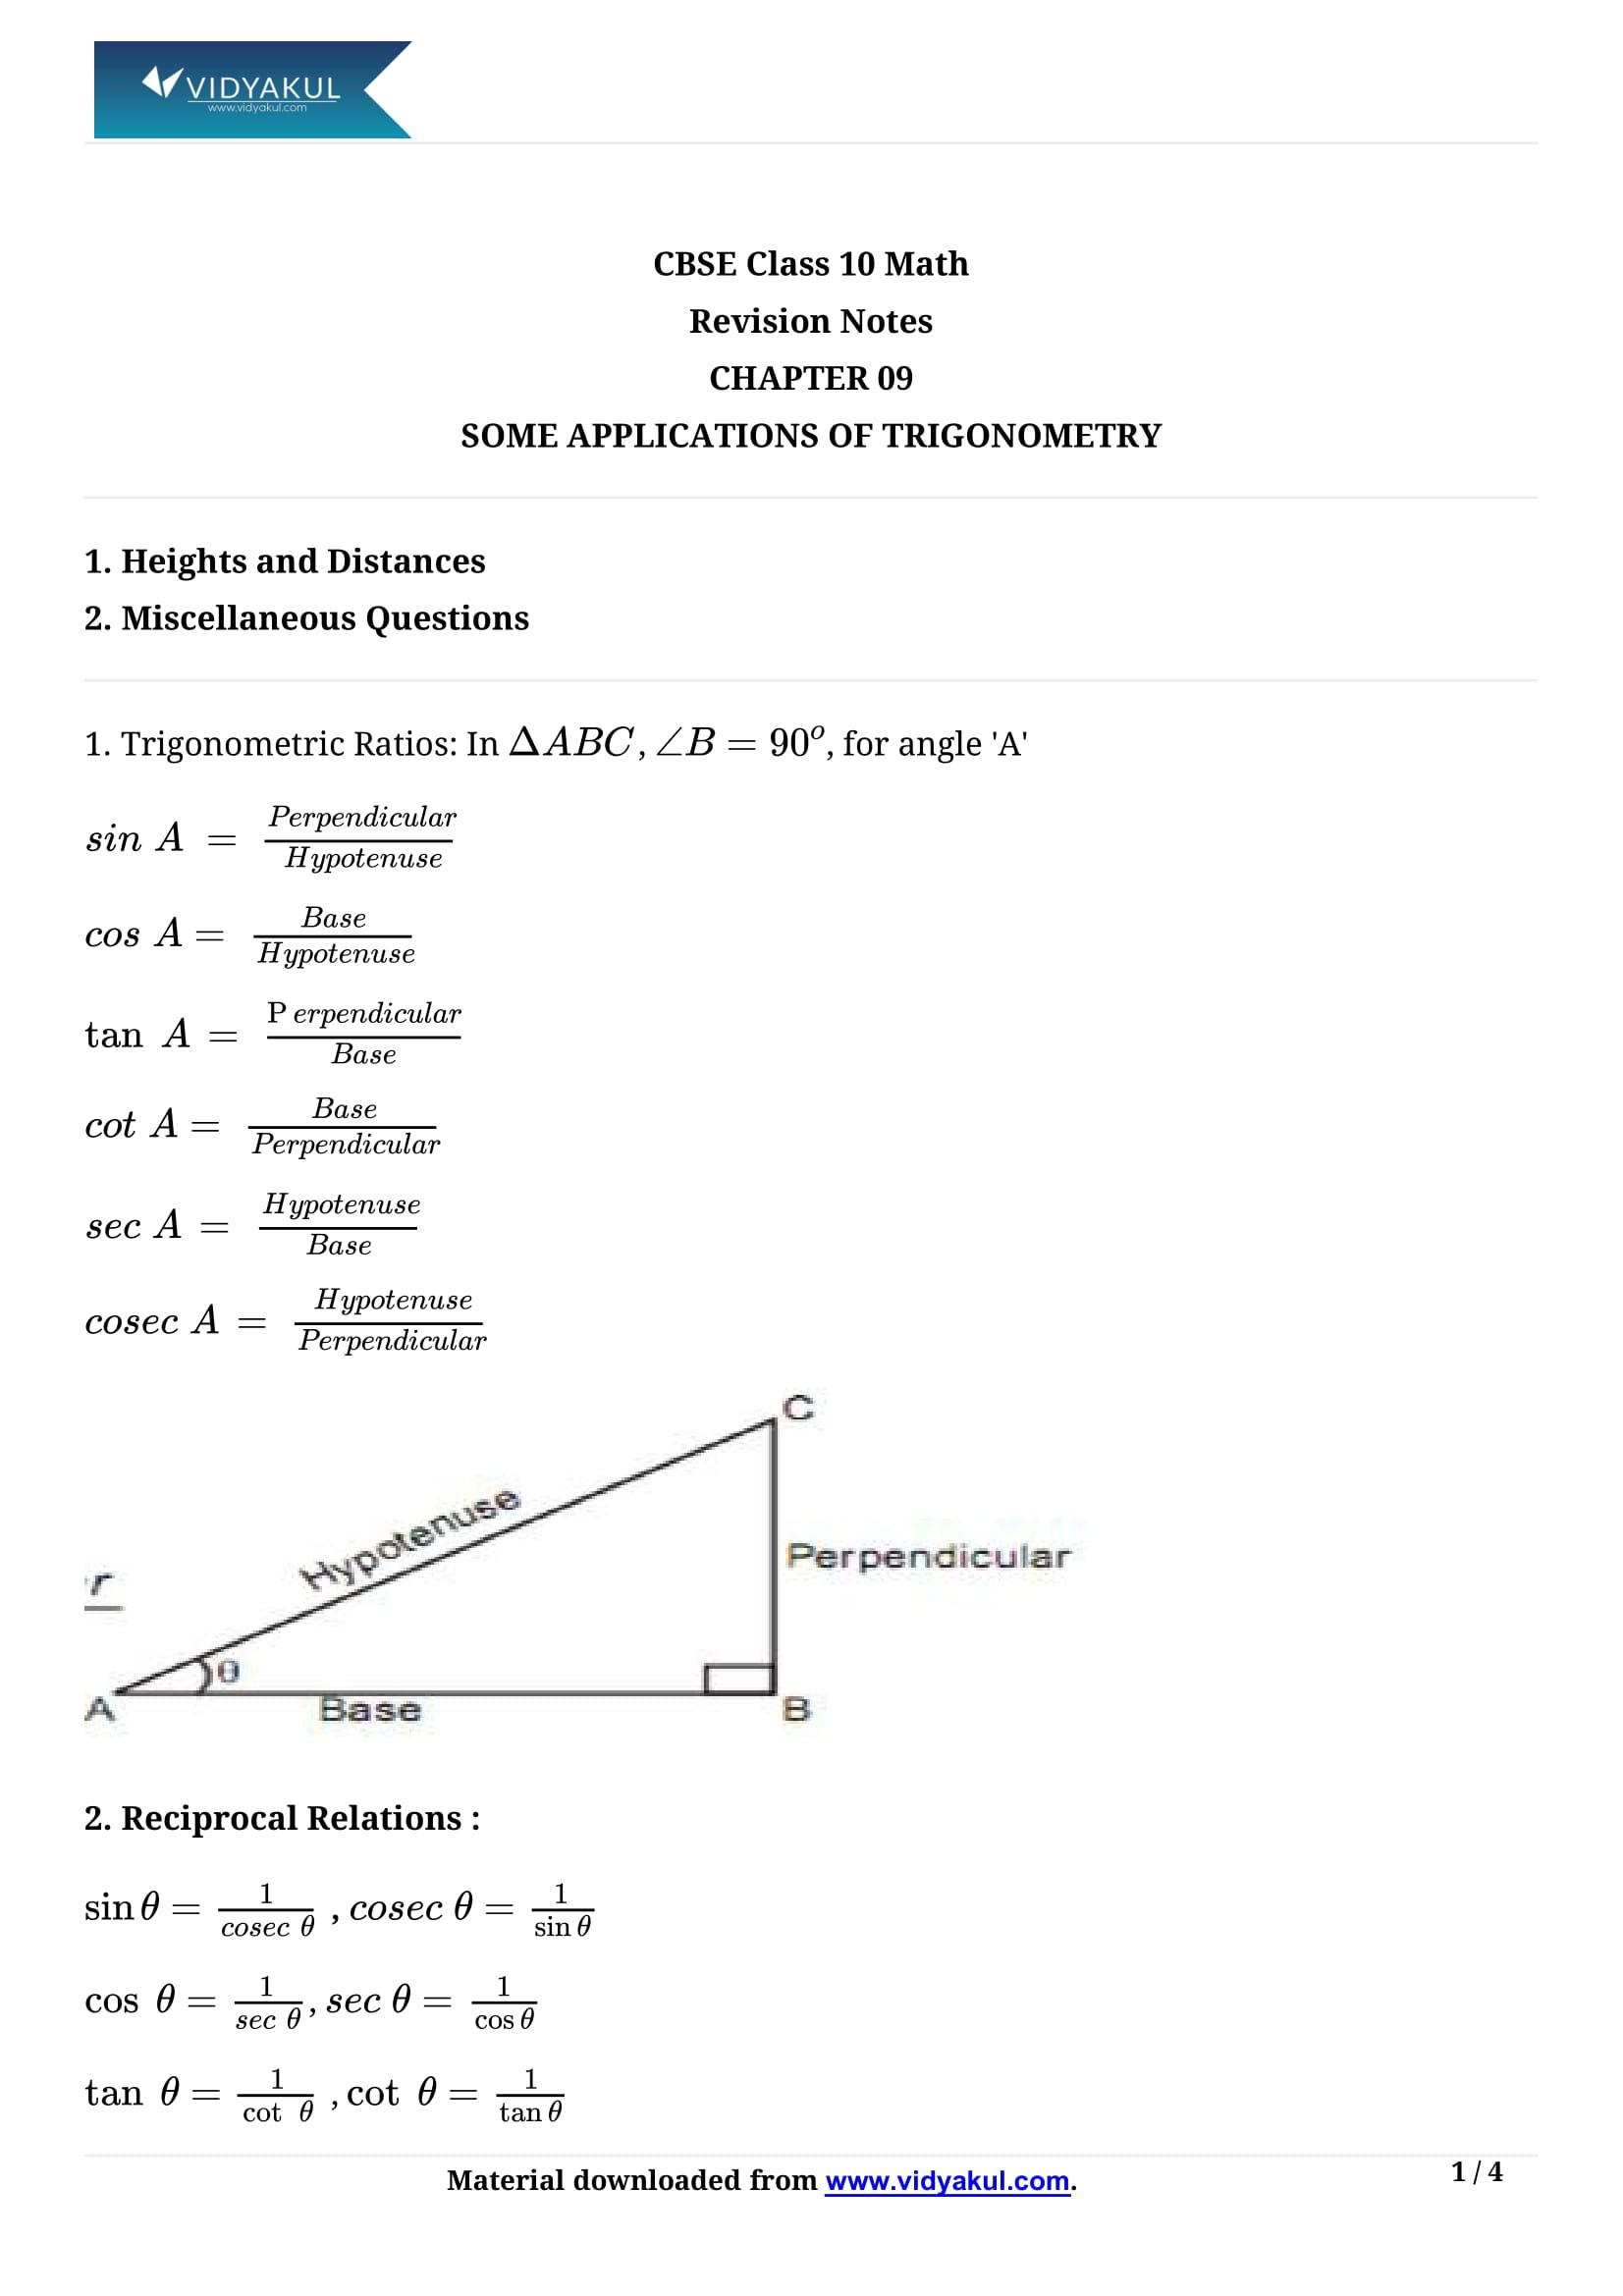 Some Applications of Trigonometry Class 10 Notes | Vidyakul